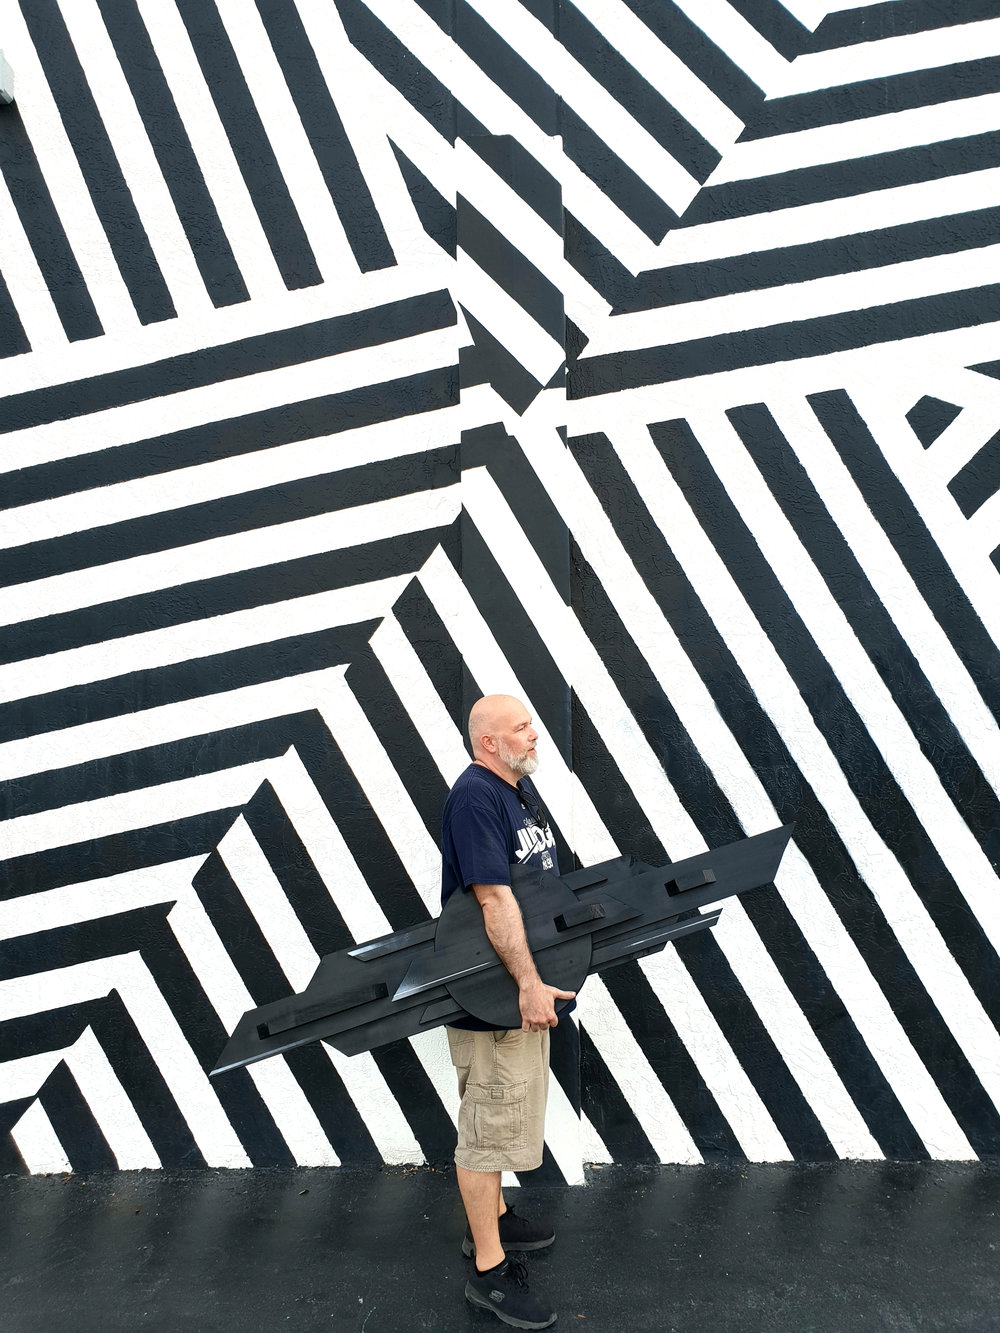 Magaldi-Live-painting-Miami-2018-2.jpg